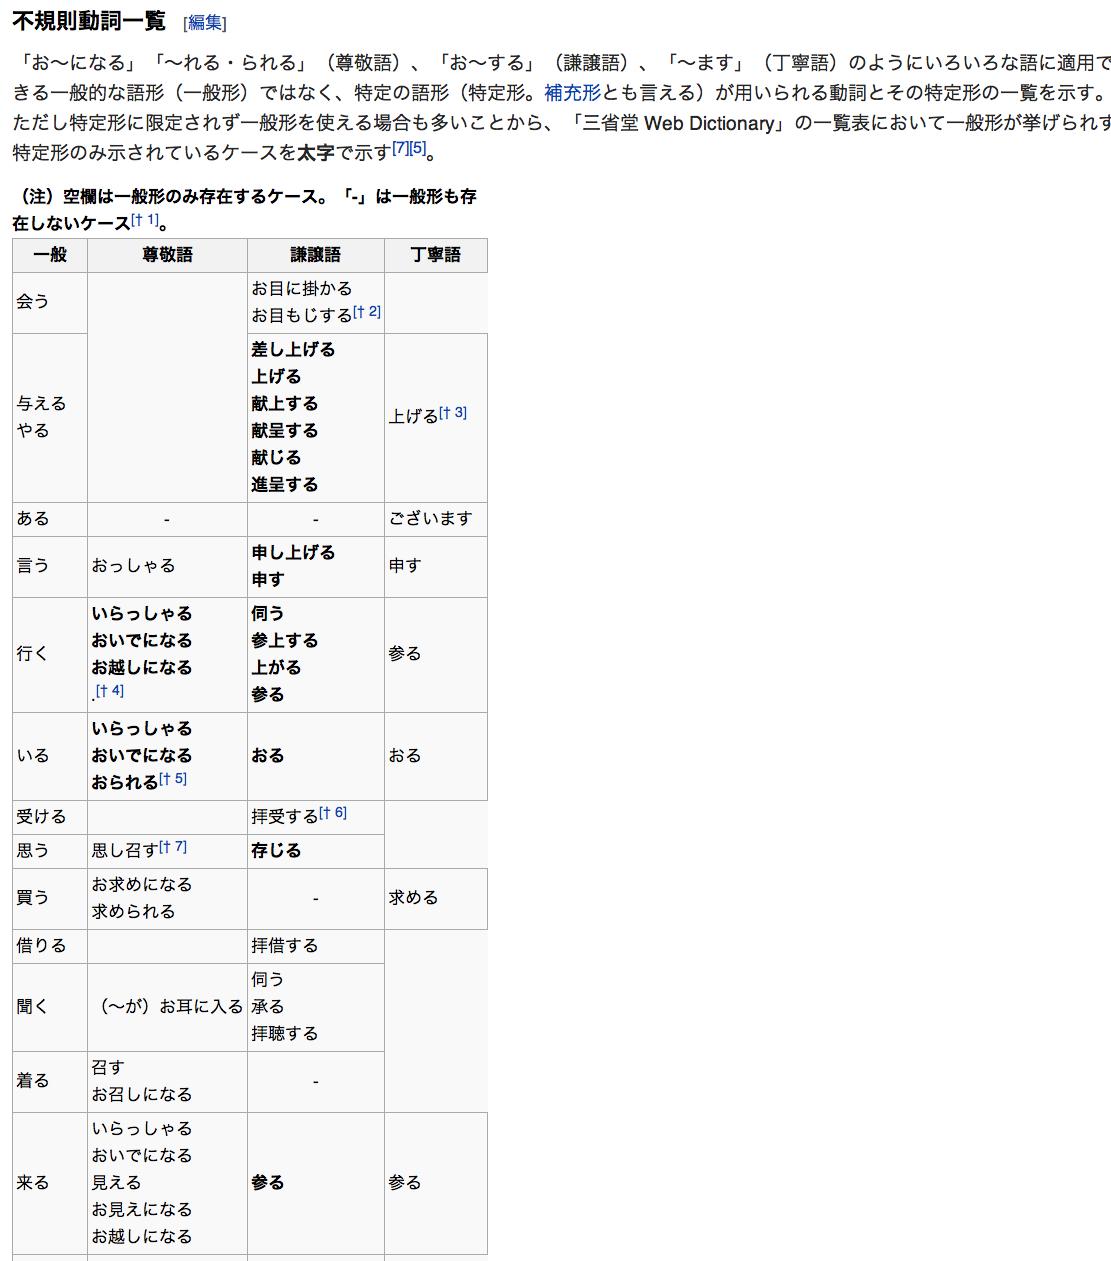 jWikipedia1.jpg